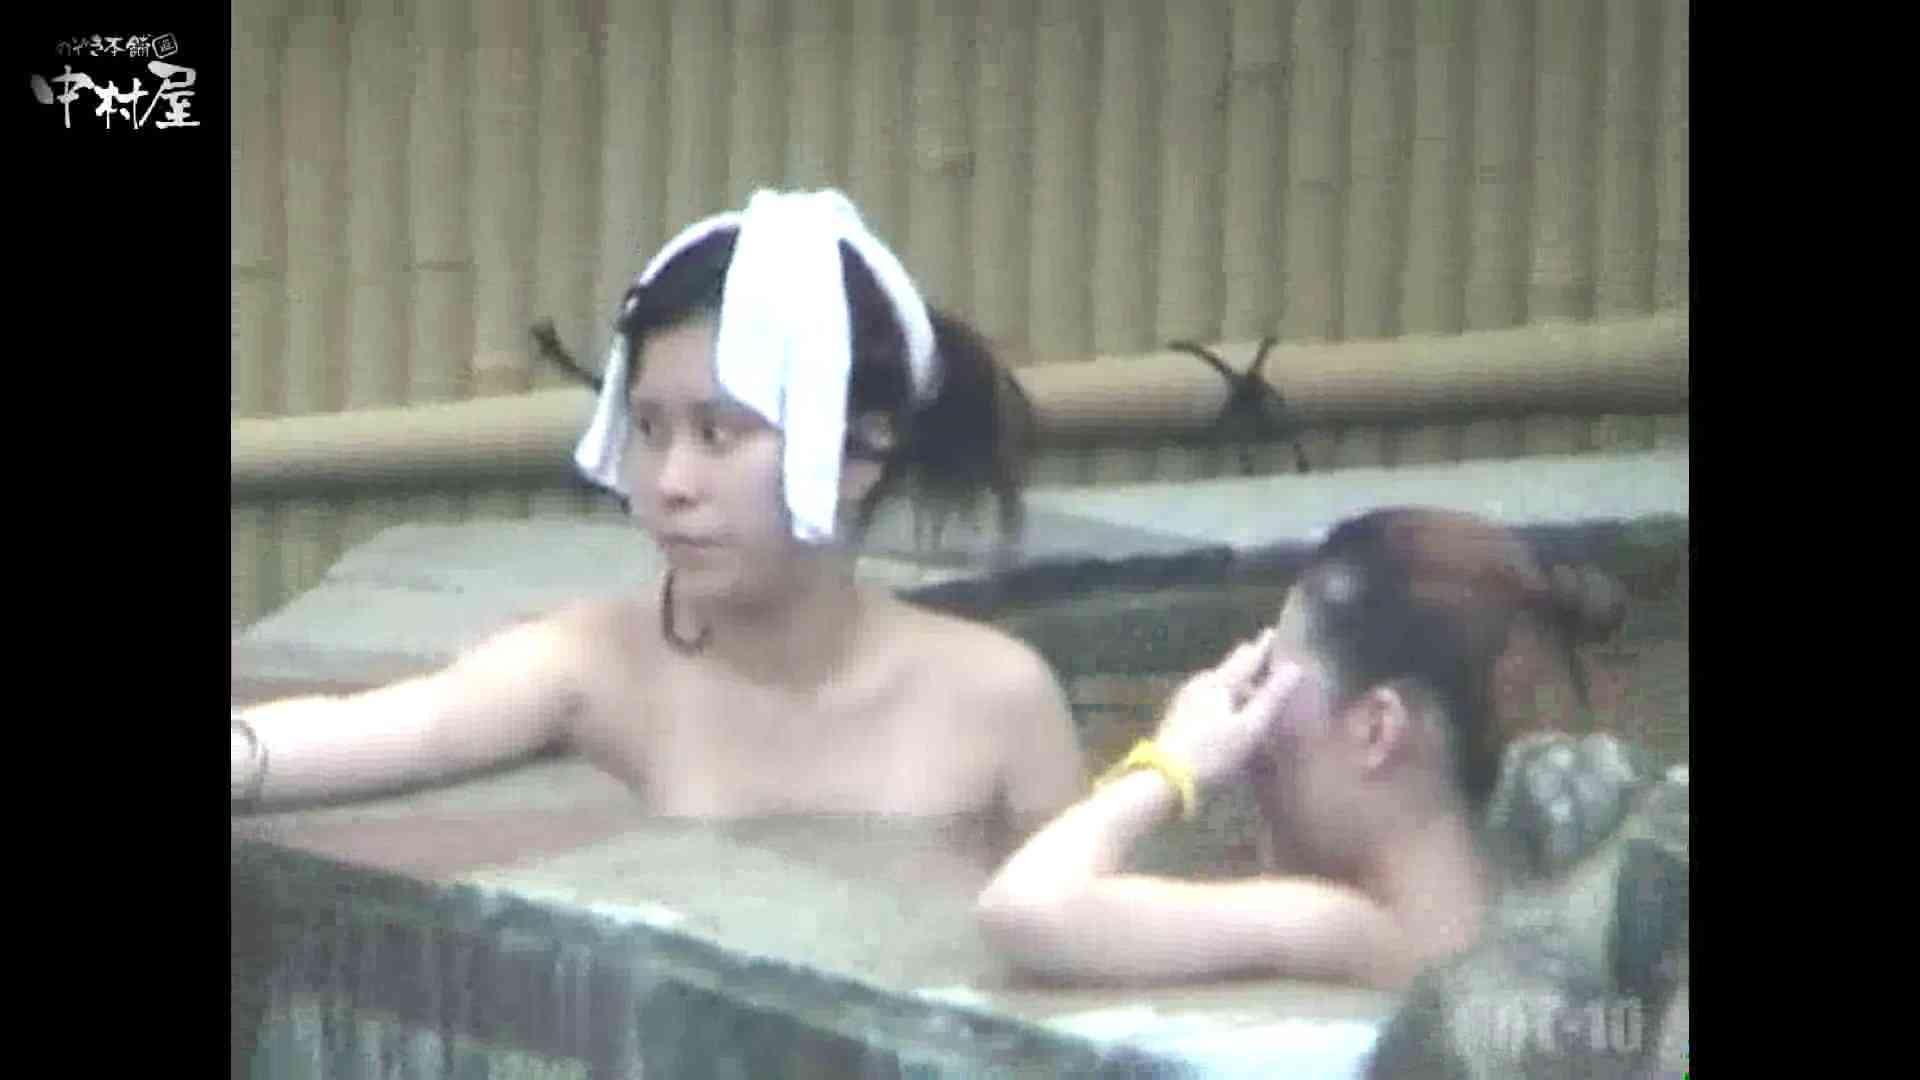 Aquaな露天風呂Vol.874潜入盗撮露天風呂十判湯 其の三 盗撮 のぞき動画画像 39連発 6